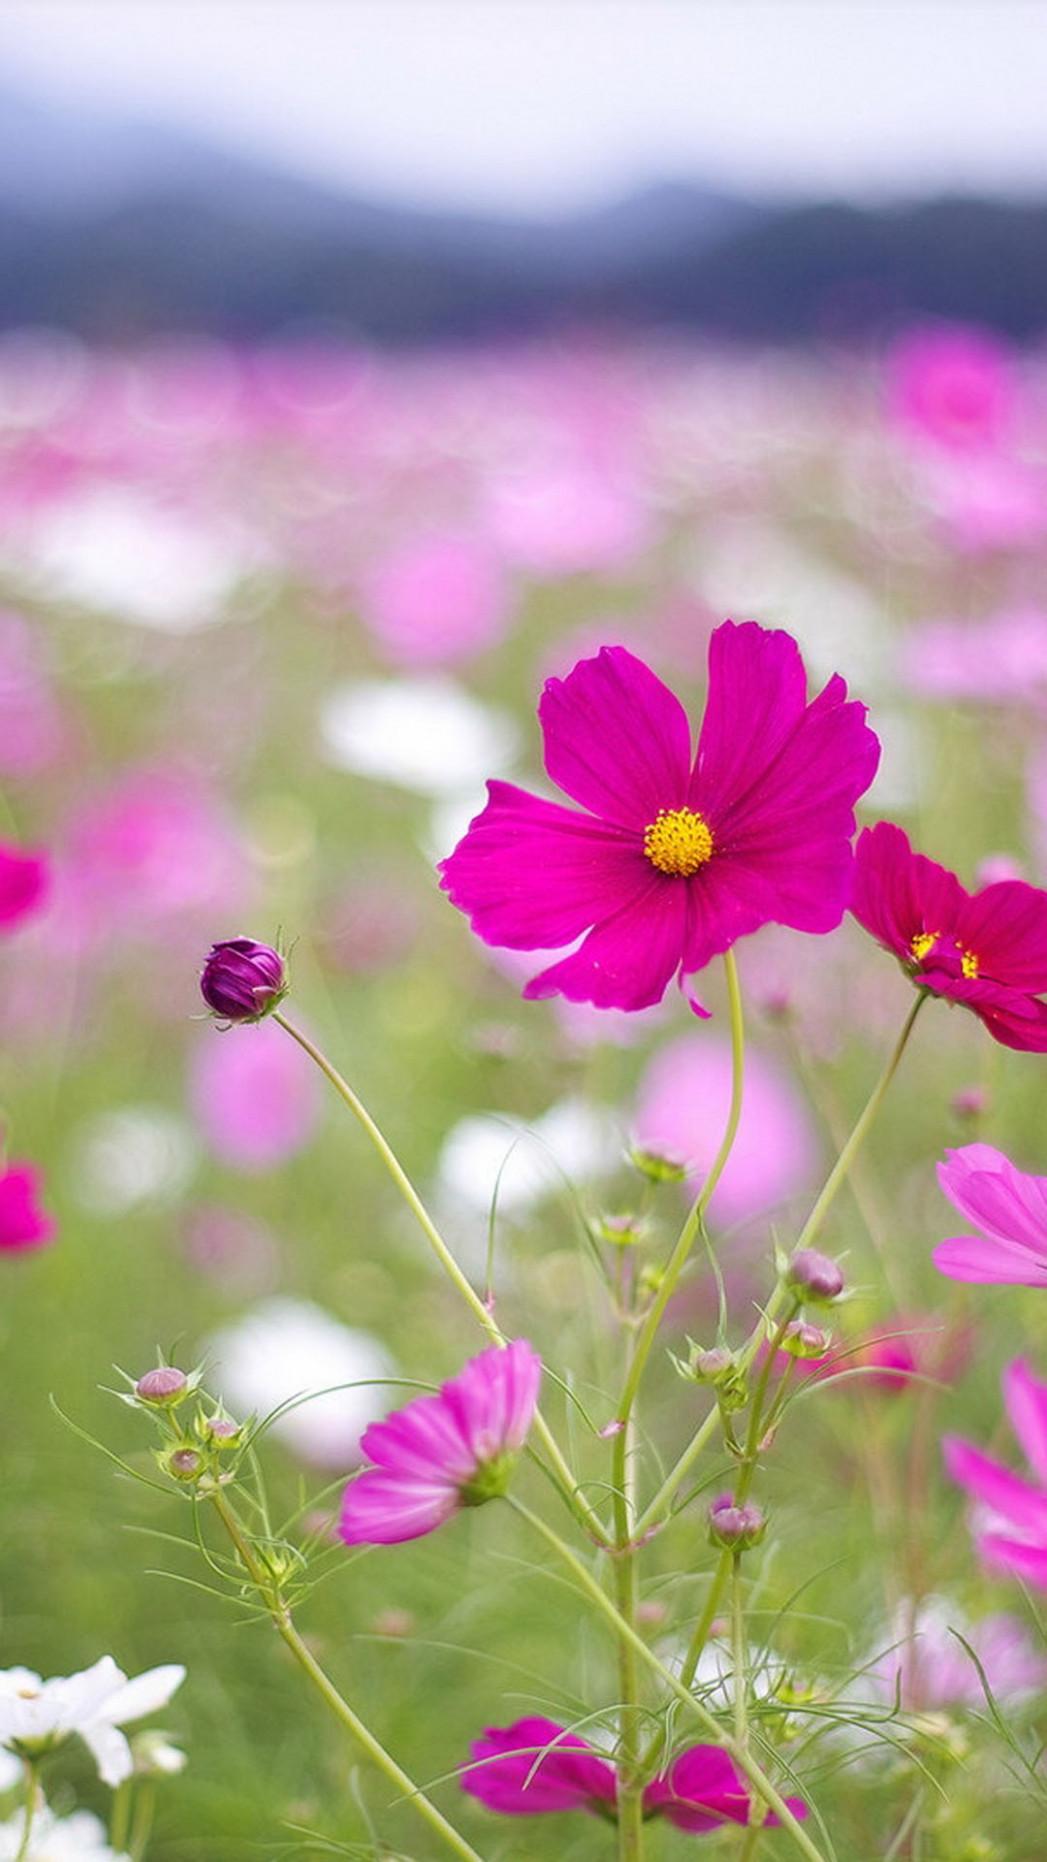 Beautiful Flowers Htc One Wallpaper Best Htc One Wallpapers - Beautiful Wallpapers For Mobile , HD Wallpaper & Backgrounds